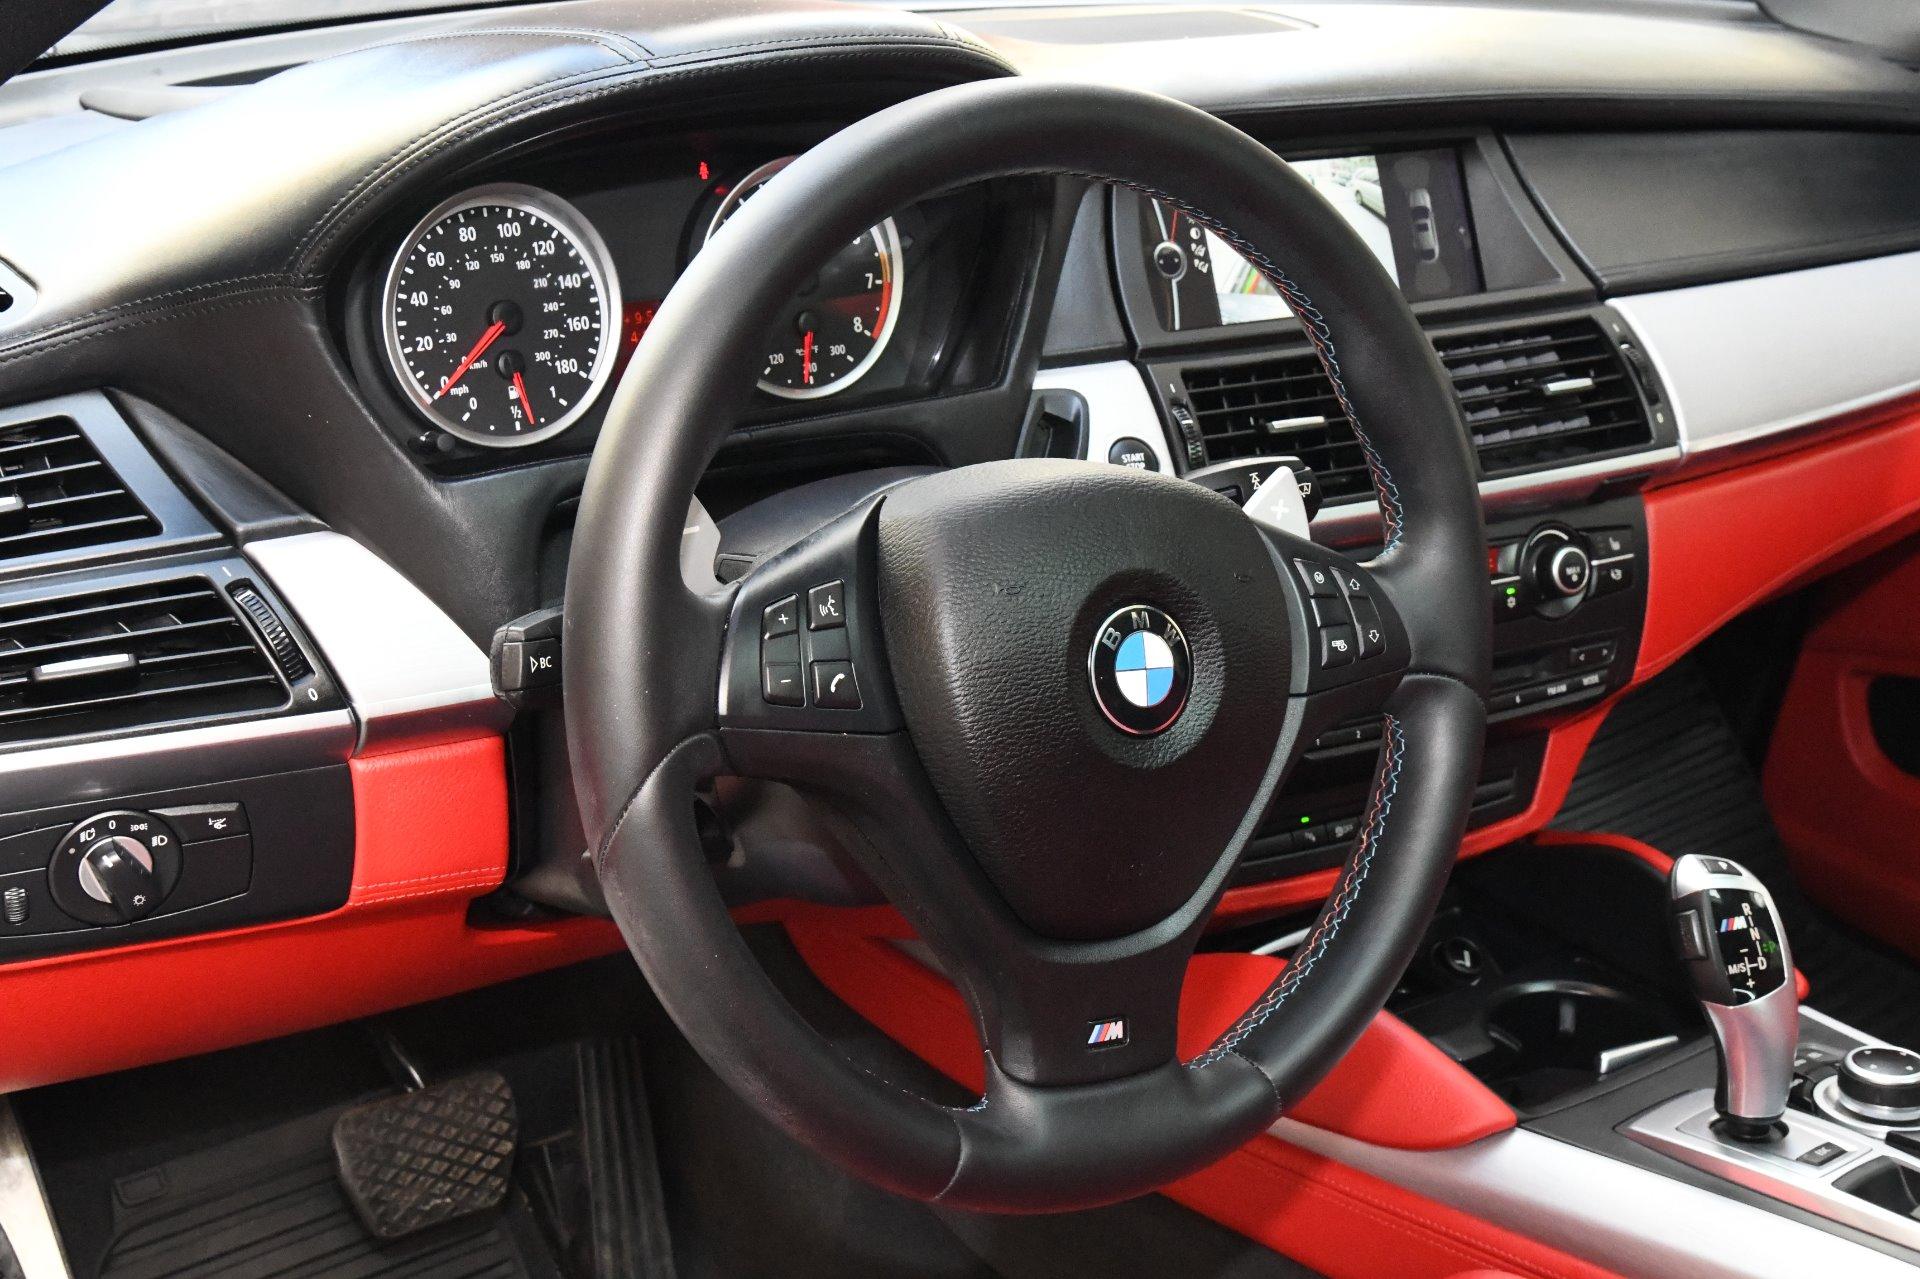 Used 2014 BMW X6 M  | Chicago, IL